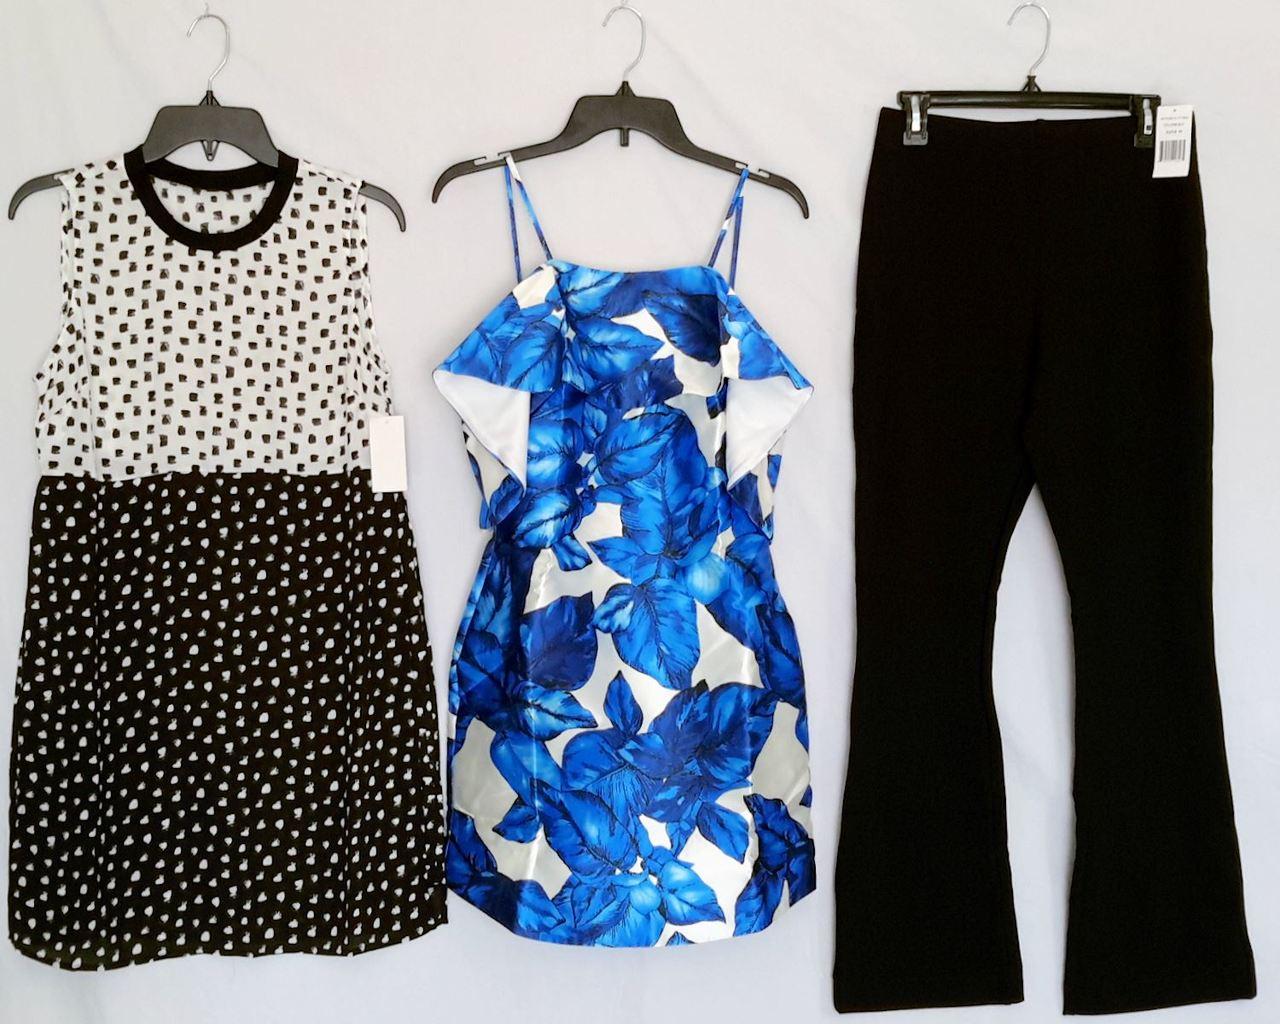 Wholesale Lot of 105 Designer Womens CLOTHING CLOTHING Renn Shameless Mixed Sizes Styles Brand New O